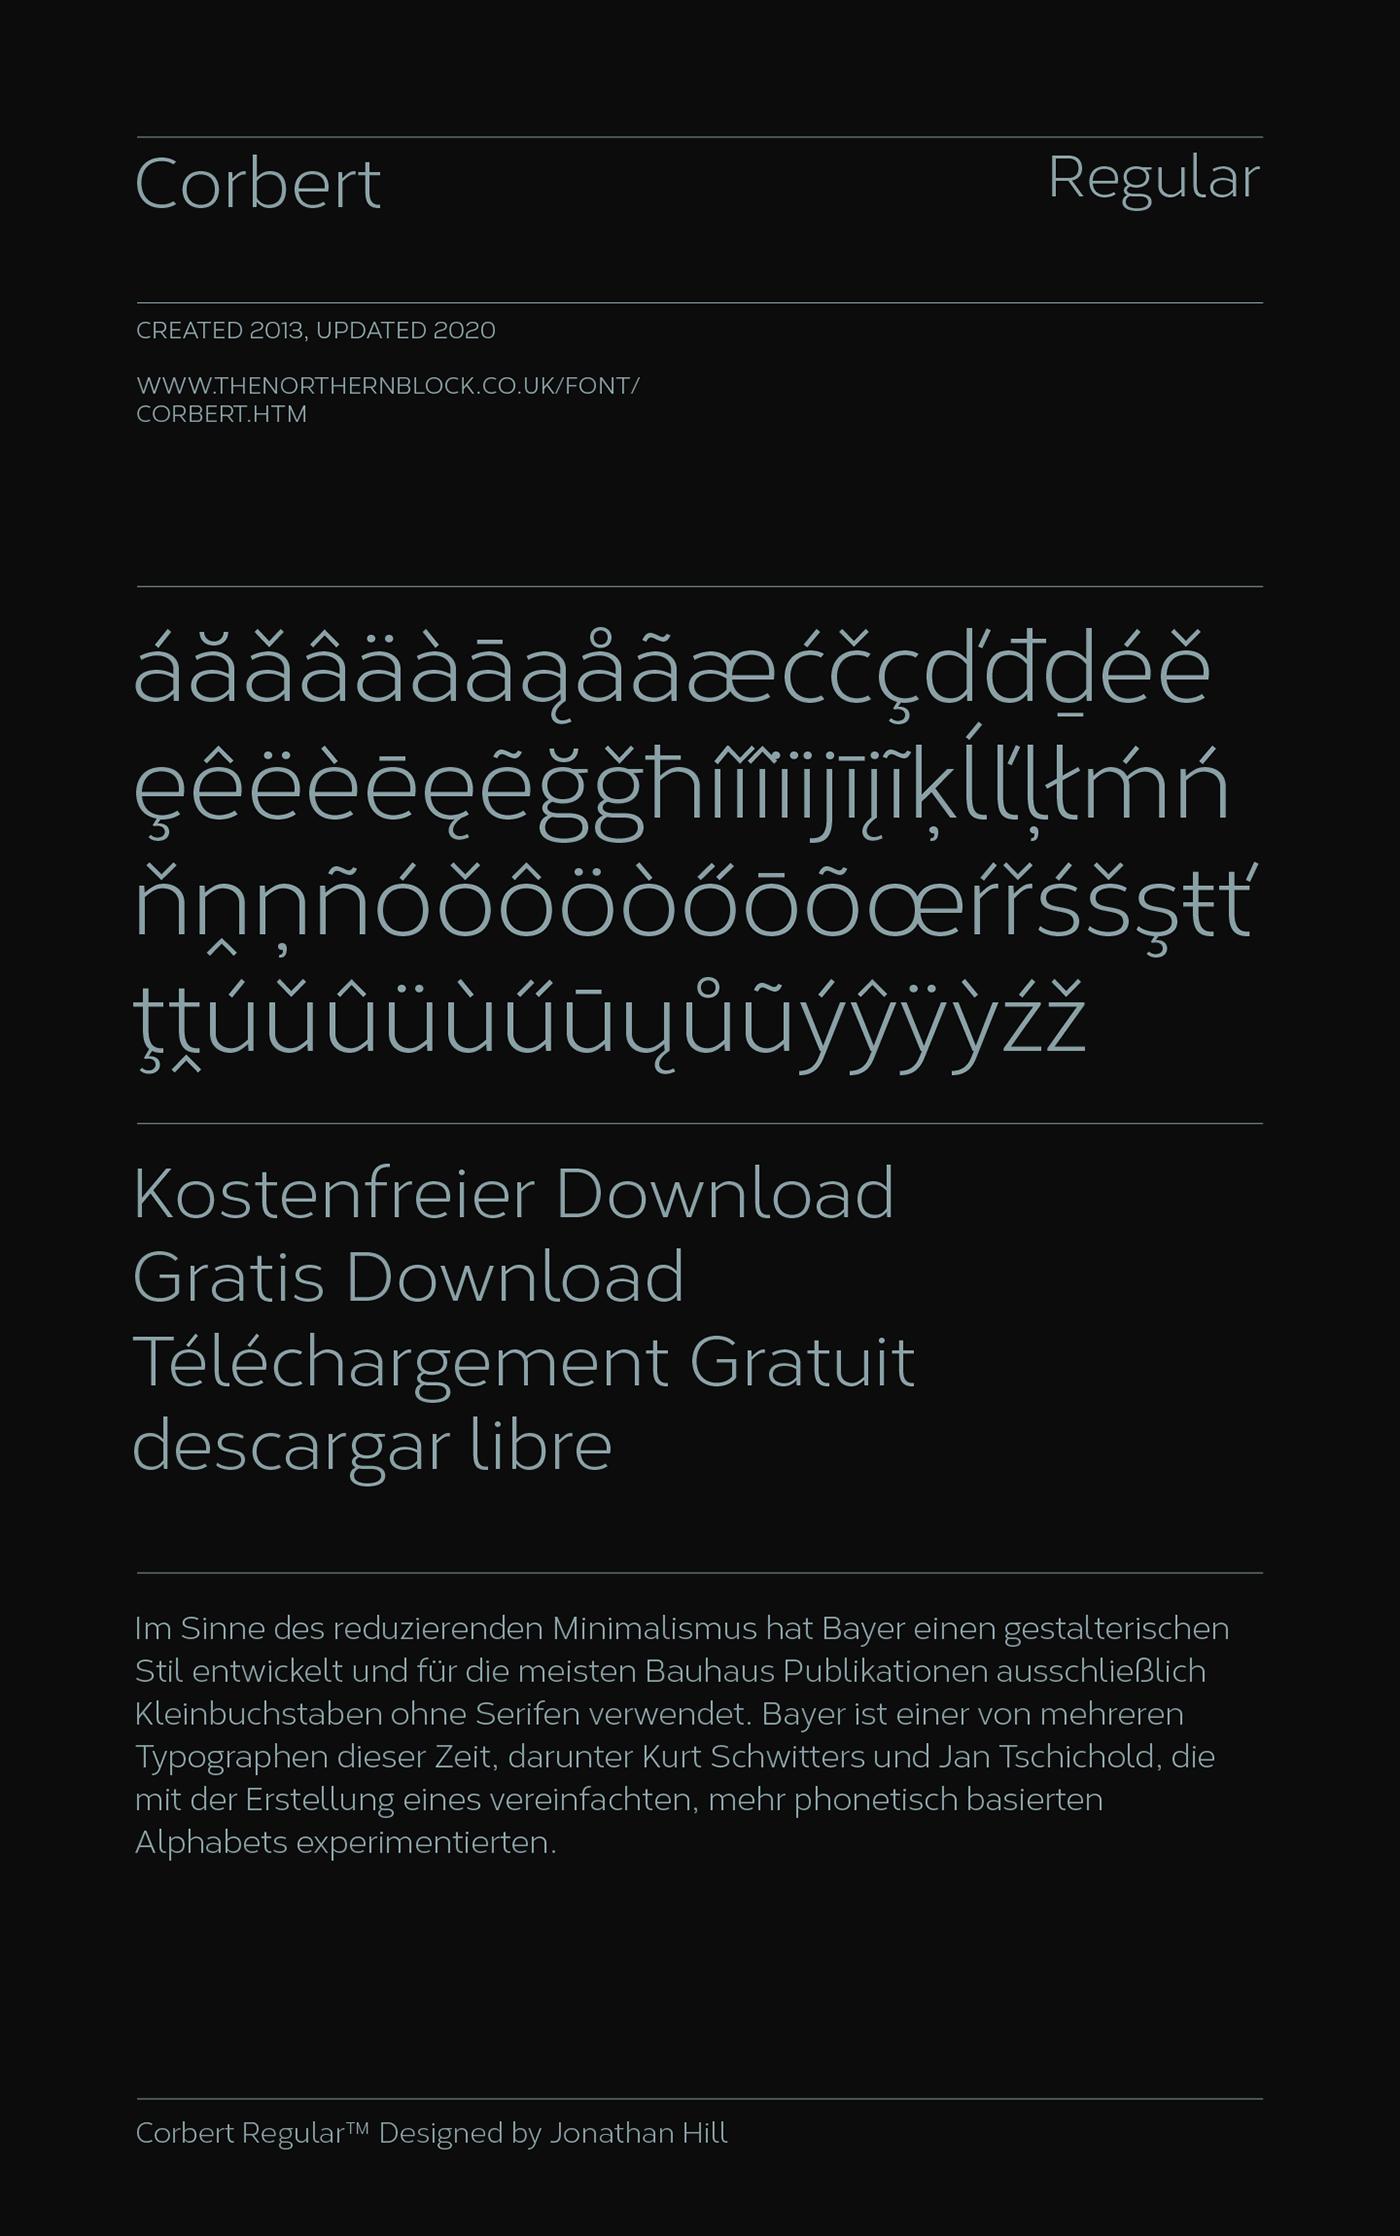 Corbert Free font type sans serif bauhaus avenir Futura font geometric sans The Northern Block